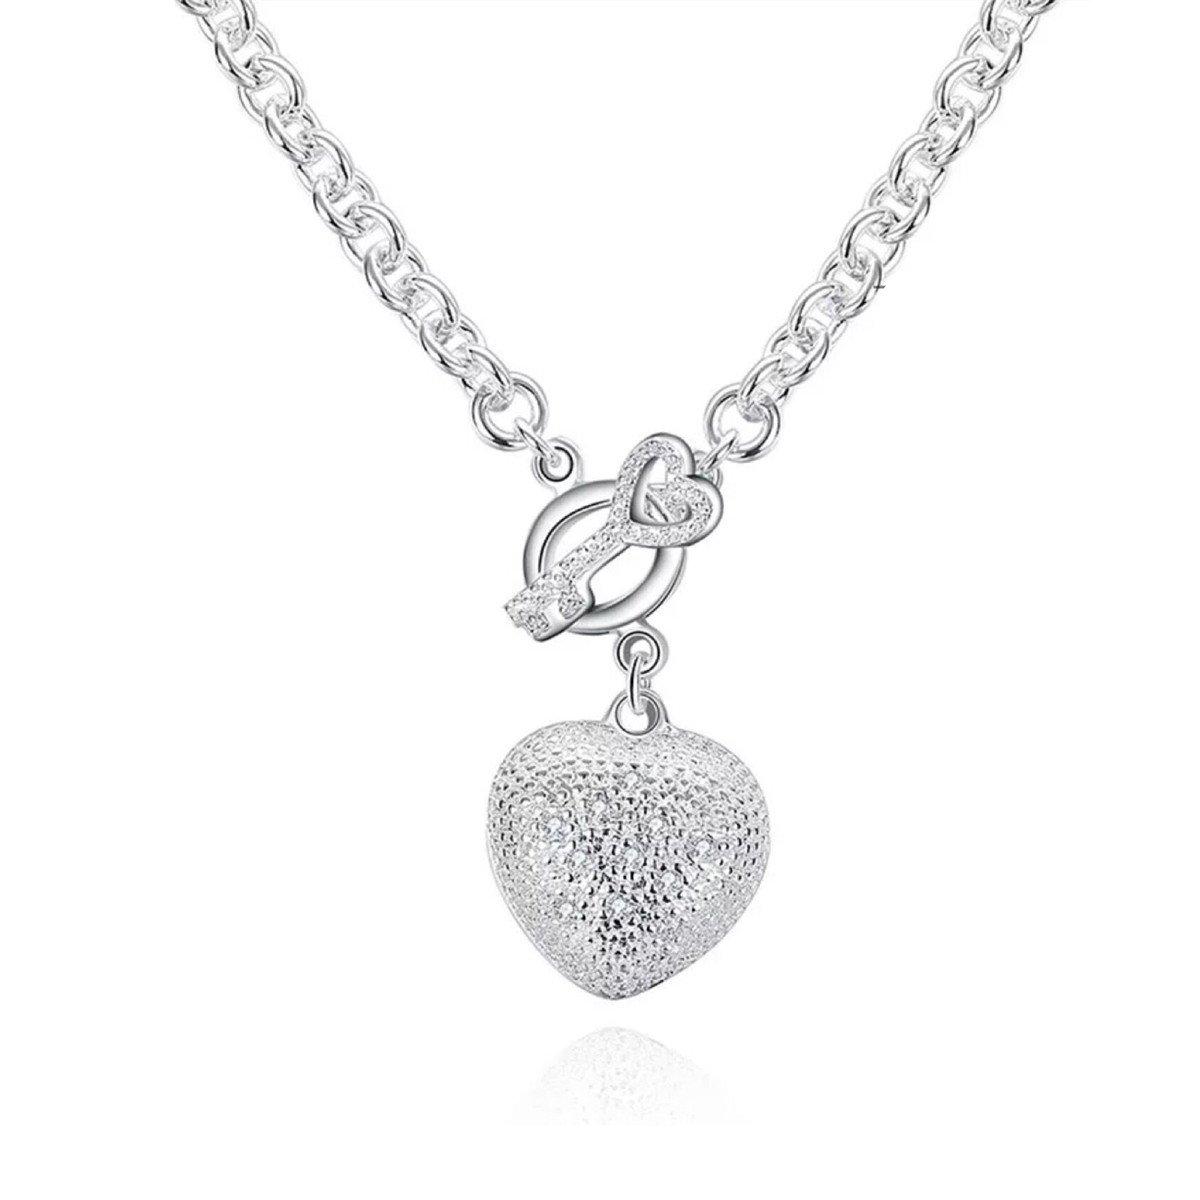 5mm 20inches 925 Sterling Silver Chain Necklace Men/ Women Fashion Jewelry New pimchanok